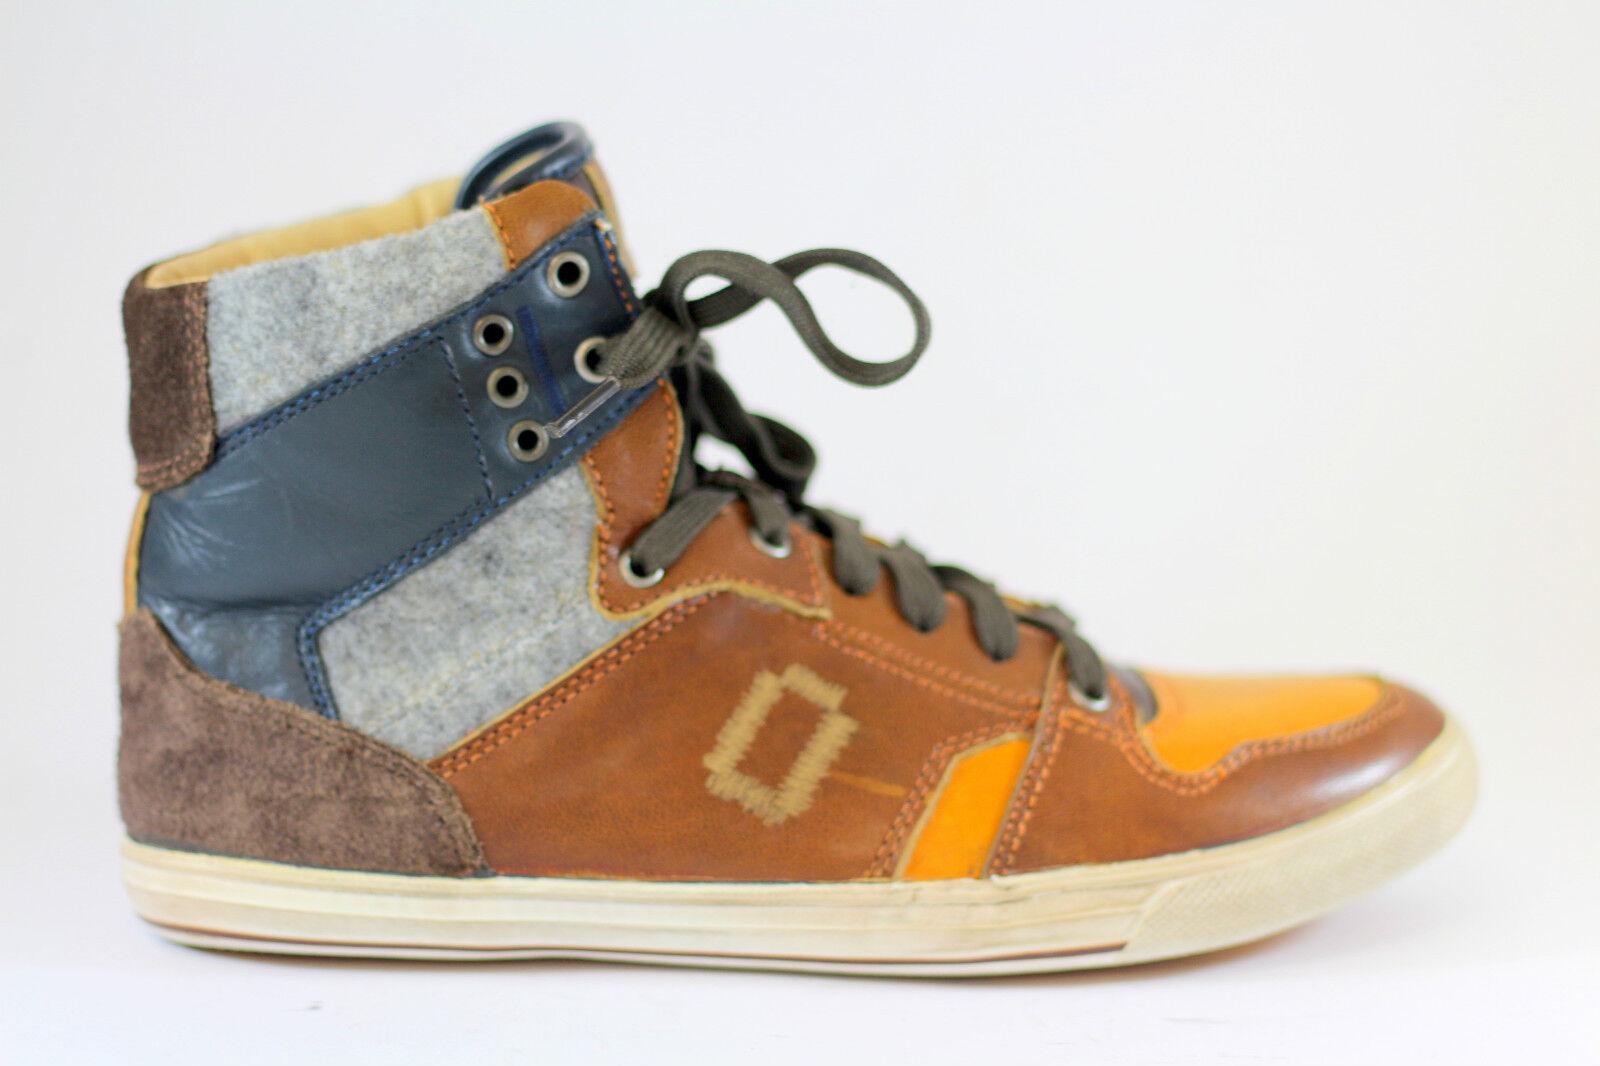 MONO leather high top scarpe da ginnastica ginnastica - scarpe da ginnastica da alte in pelle 4151b7